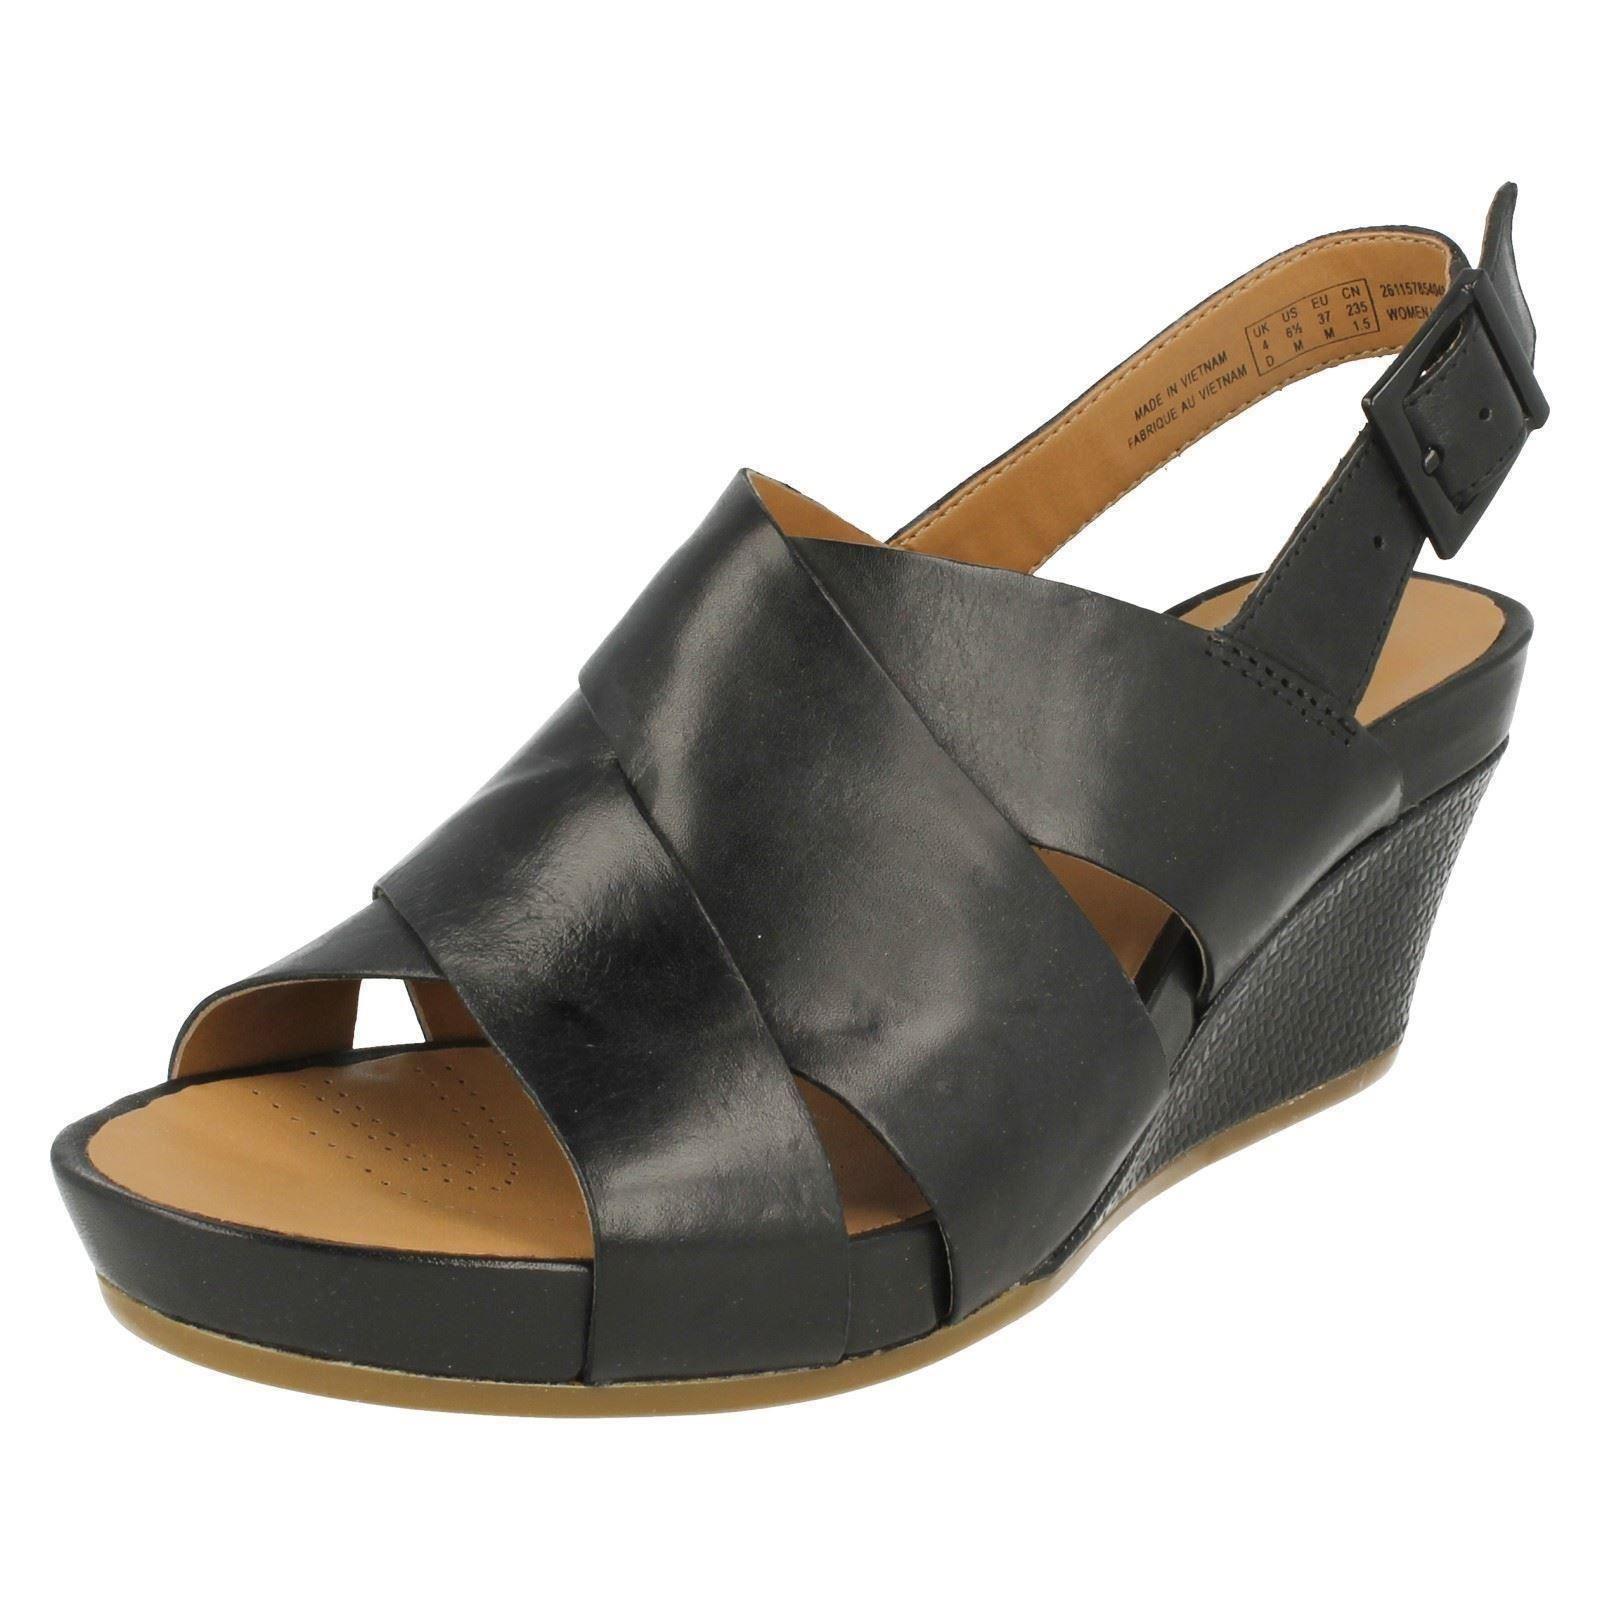 Men's/Women's Clarks Ladies Clarks Men's/Women's Wedge Sandals Rusty Rizz elegant Fast delivery various kinds f897c8